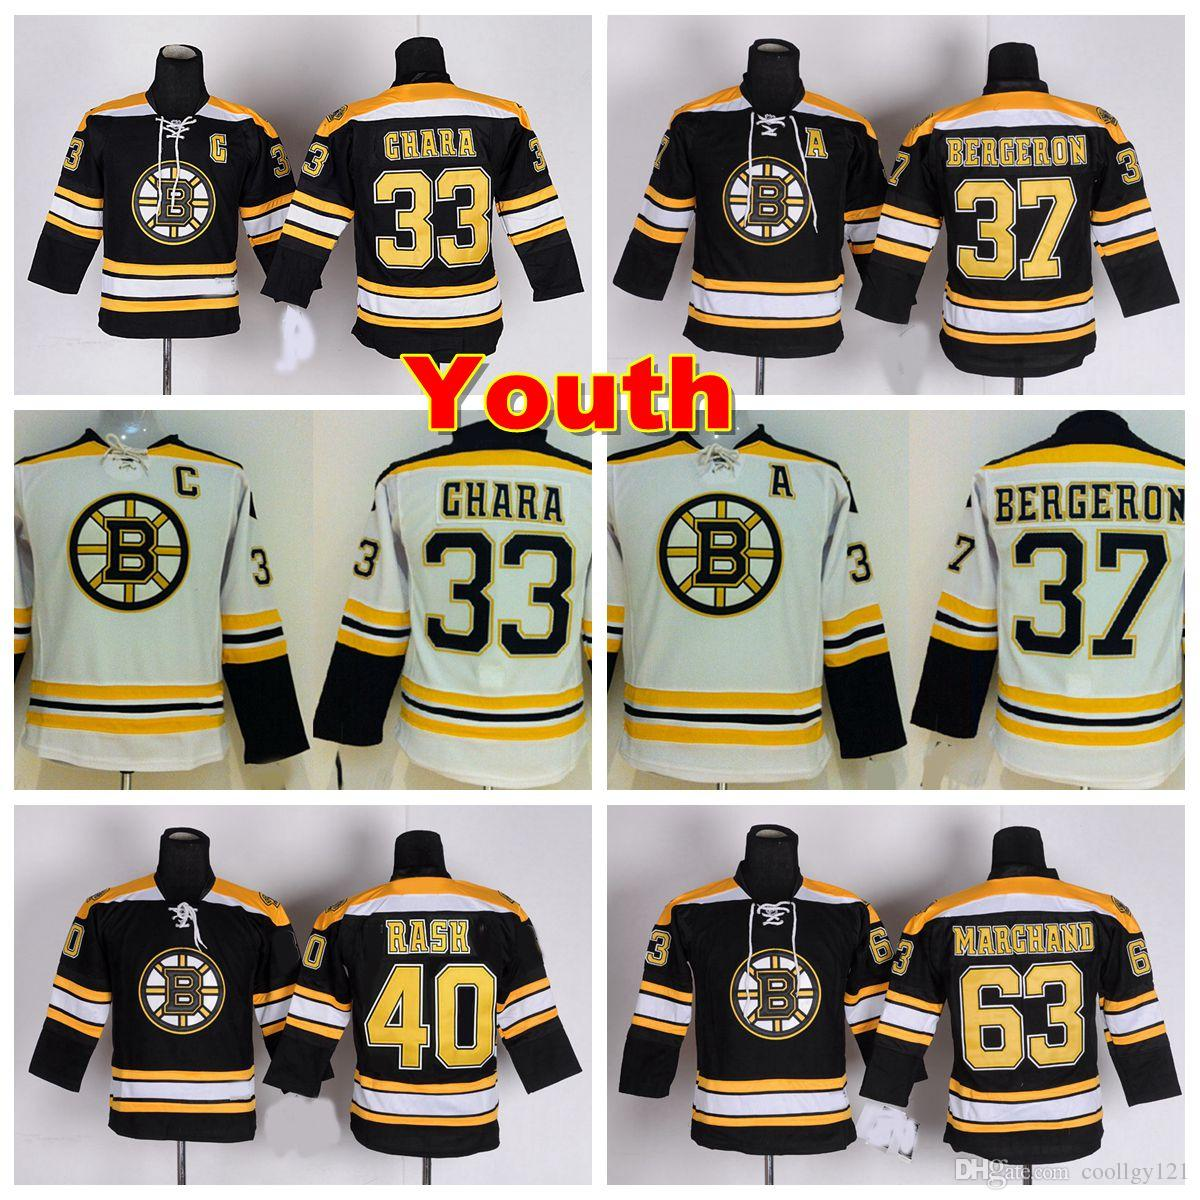 Youth Boston Bruins Jerseys Kids 37 Patrice Bergeron 33 Zdeno Chara ... e54cdbc0daf